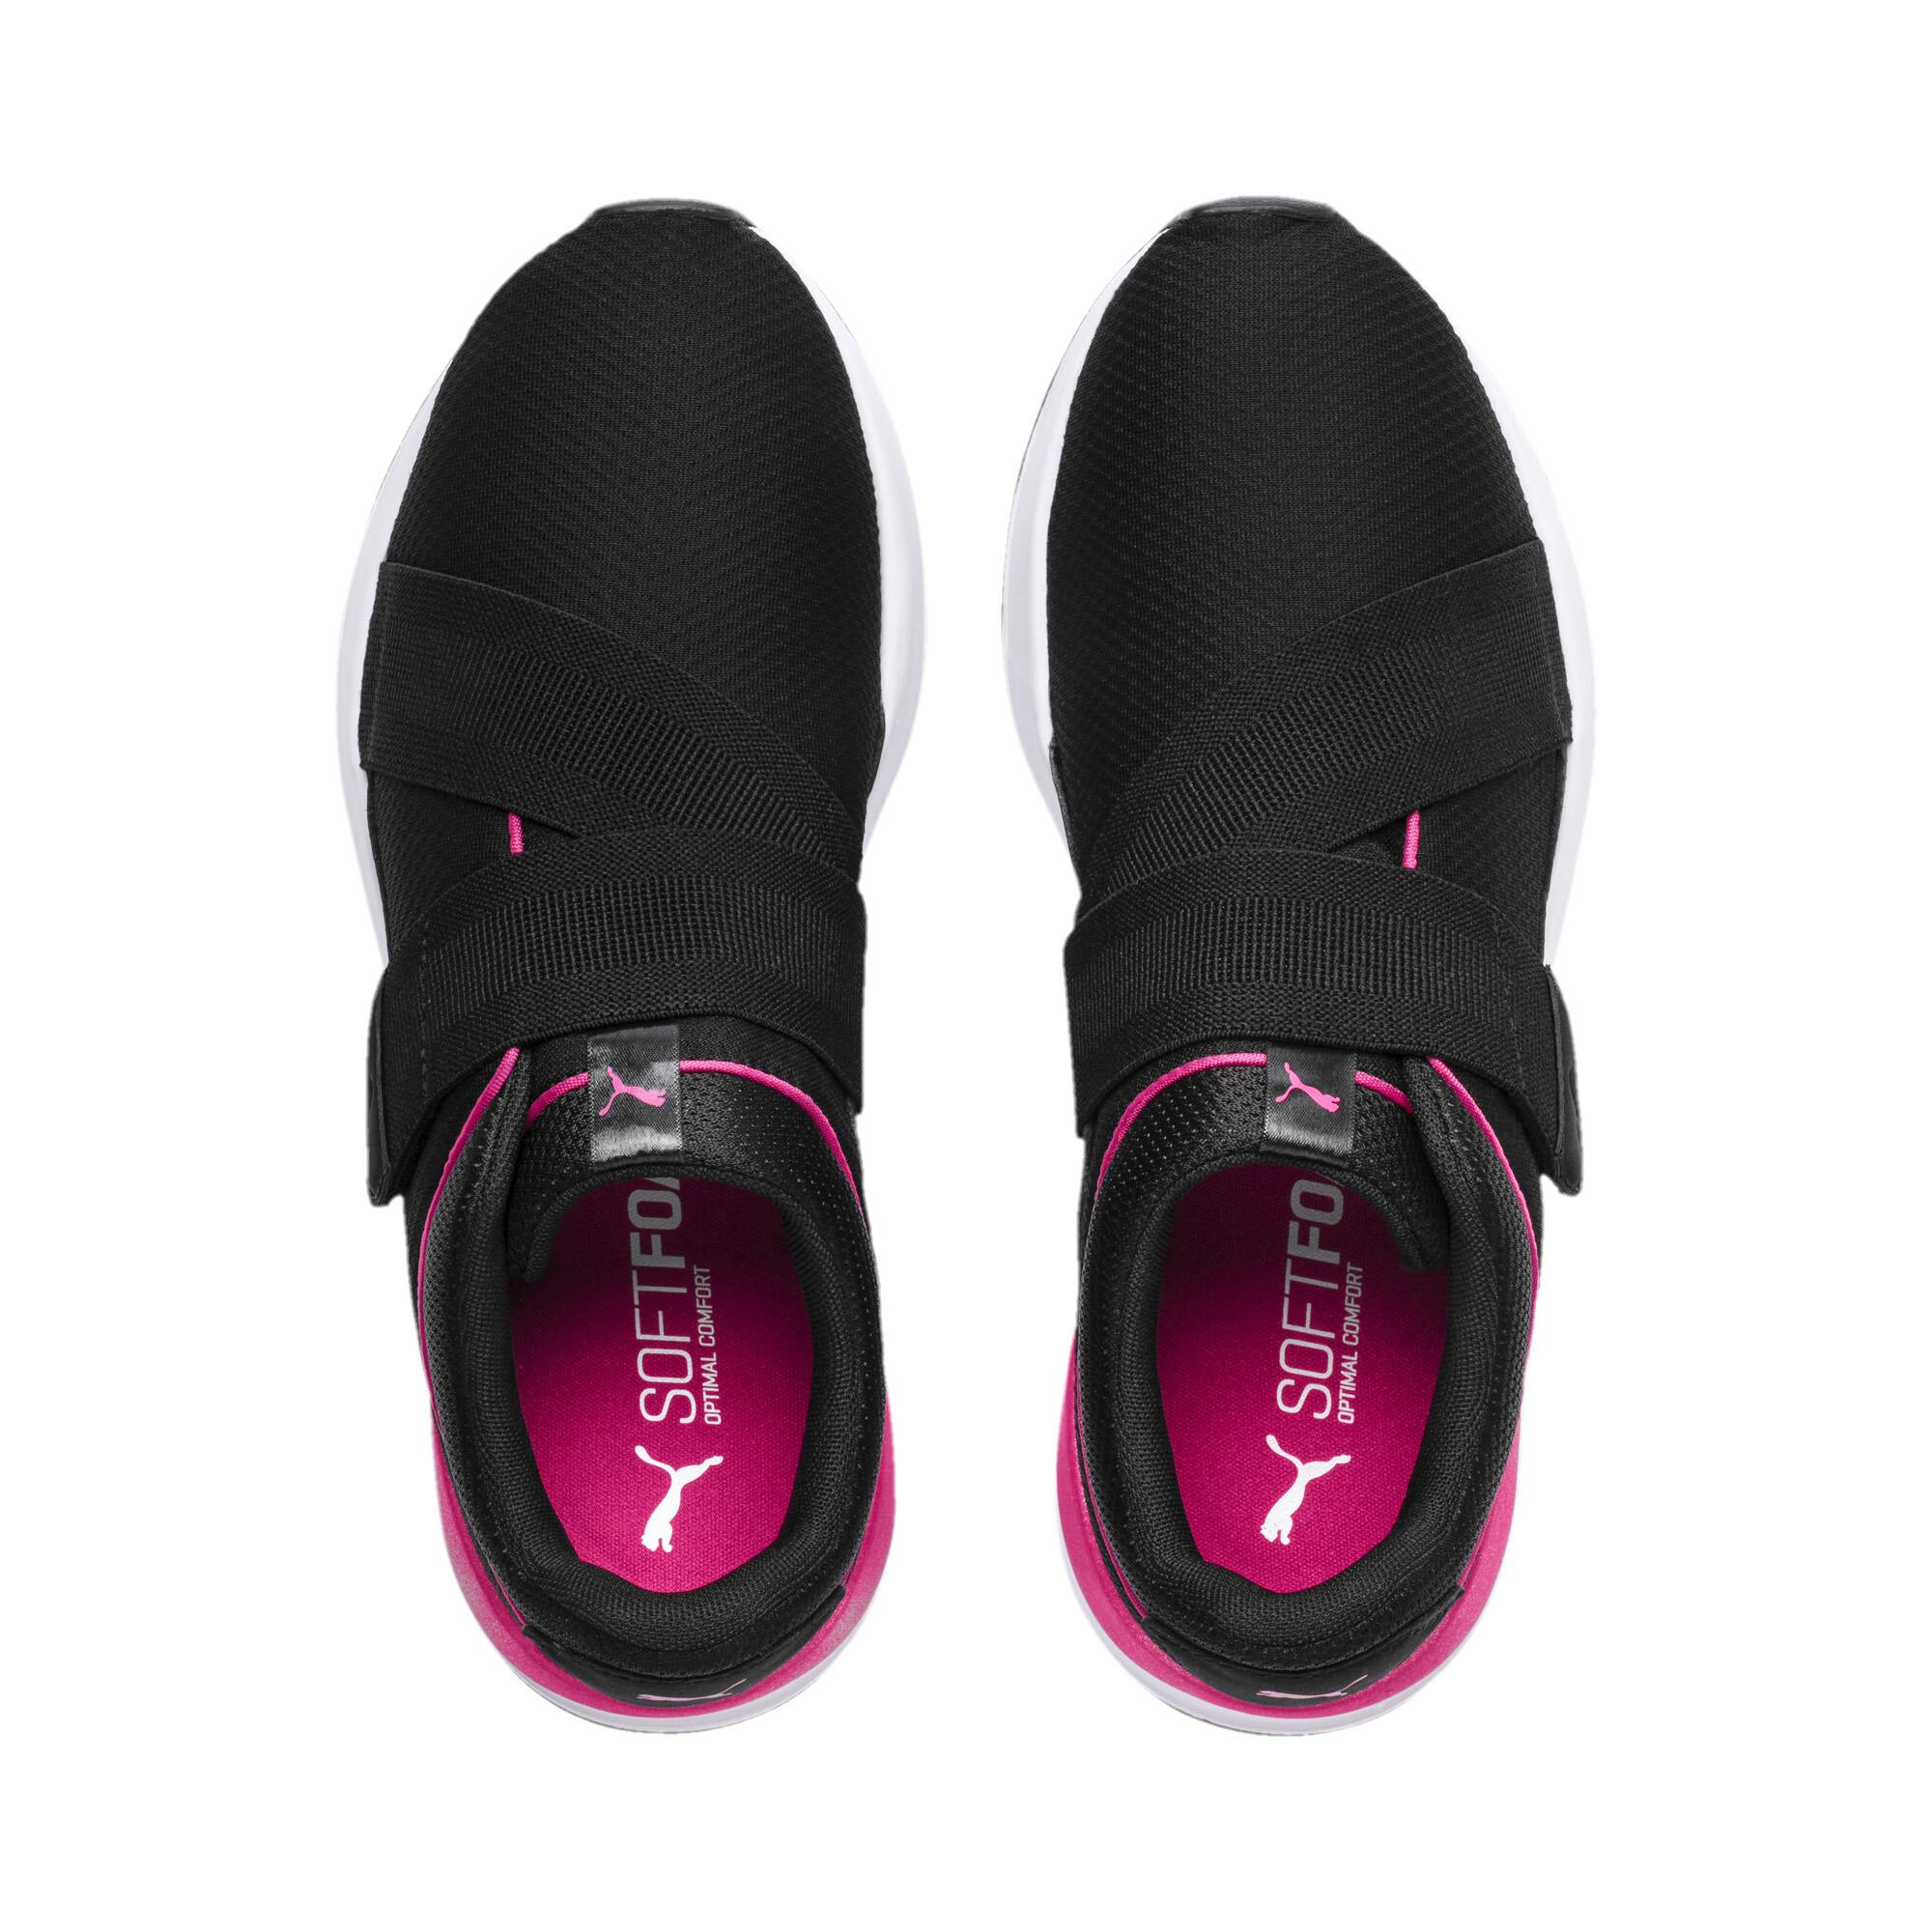 PUMA-Adela-X-Women-s-Sneakers-Women-Shoe-Basics thumbnail 12